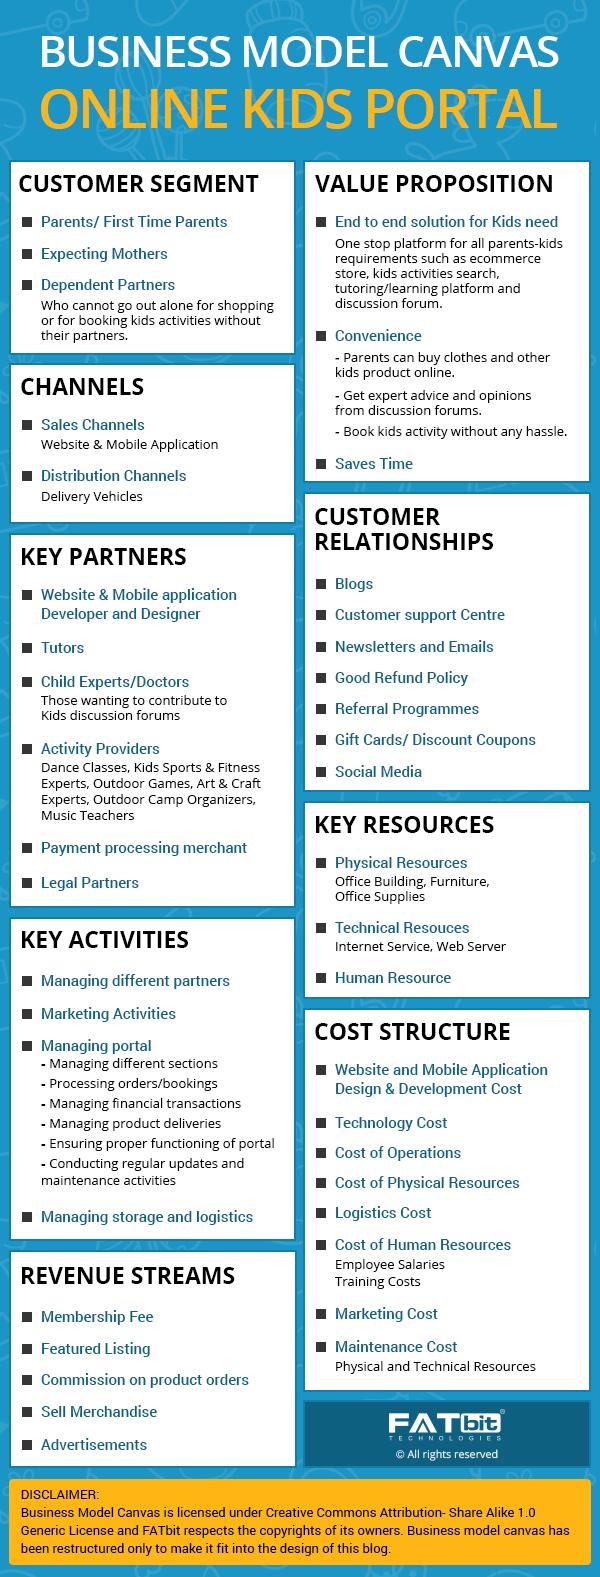 Business Model Canvas of Online Kids Portal